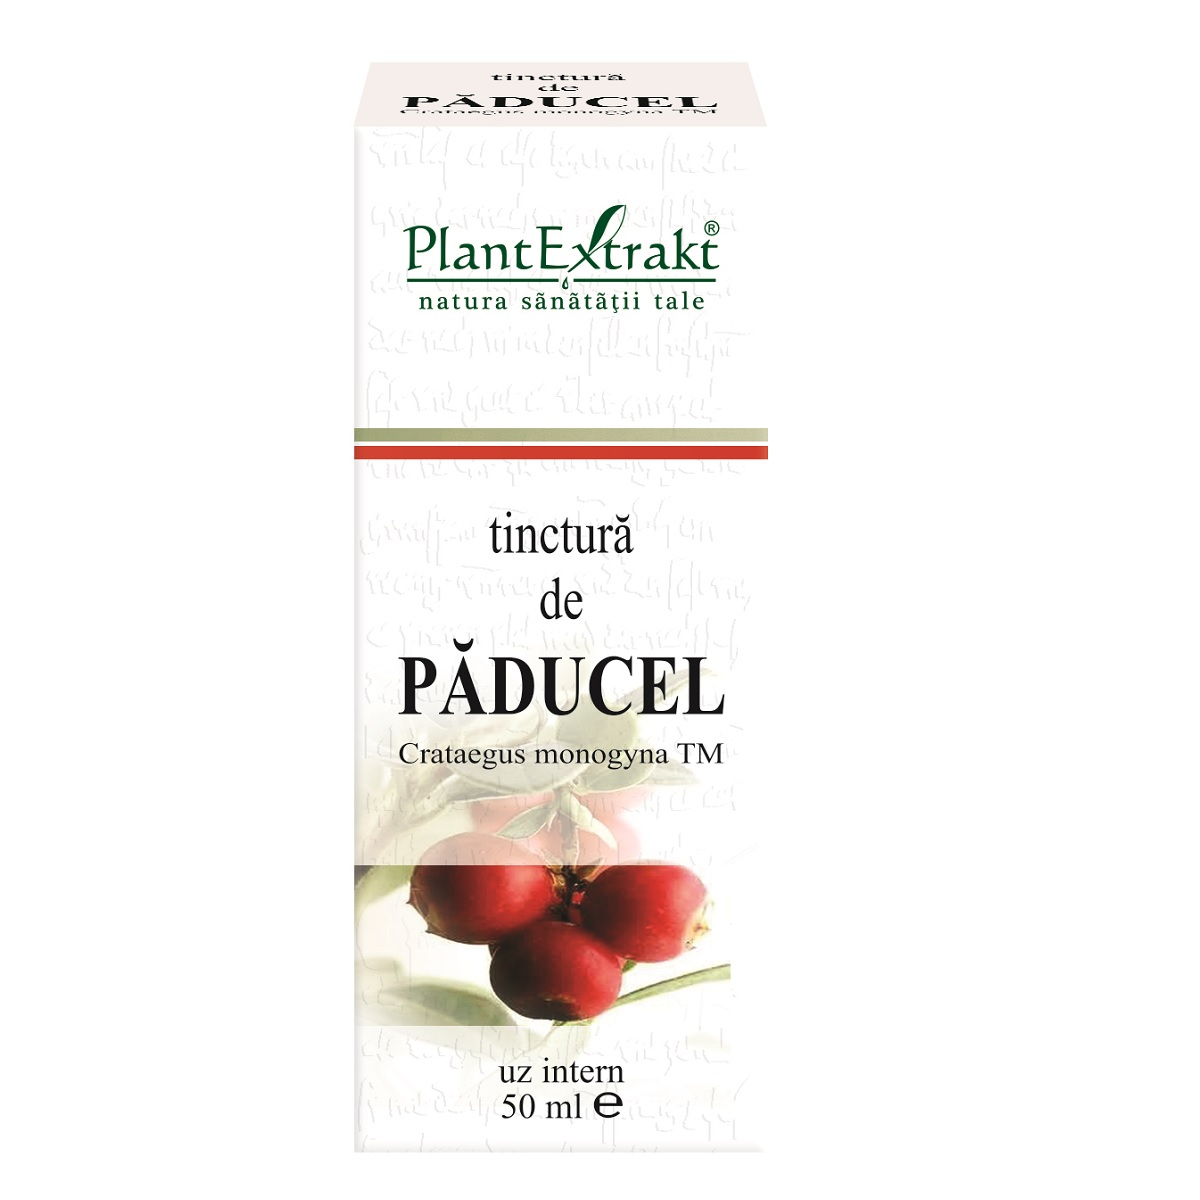 Tinctura de Paducel, 50ml, Plantextrakt imagine produs 2021